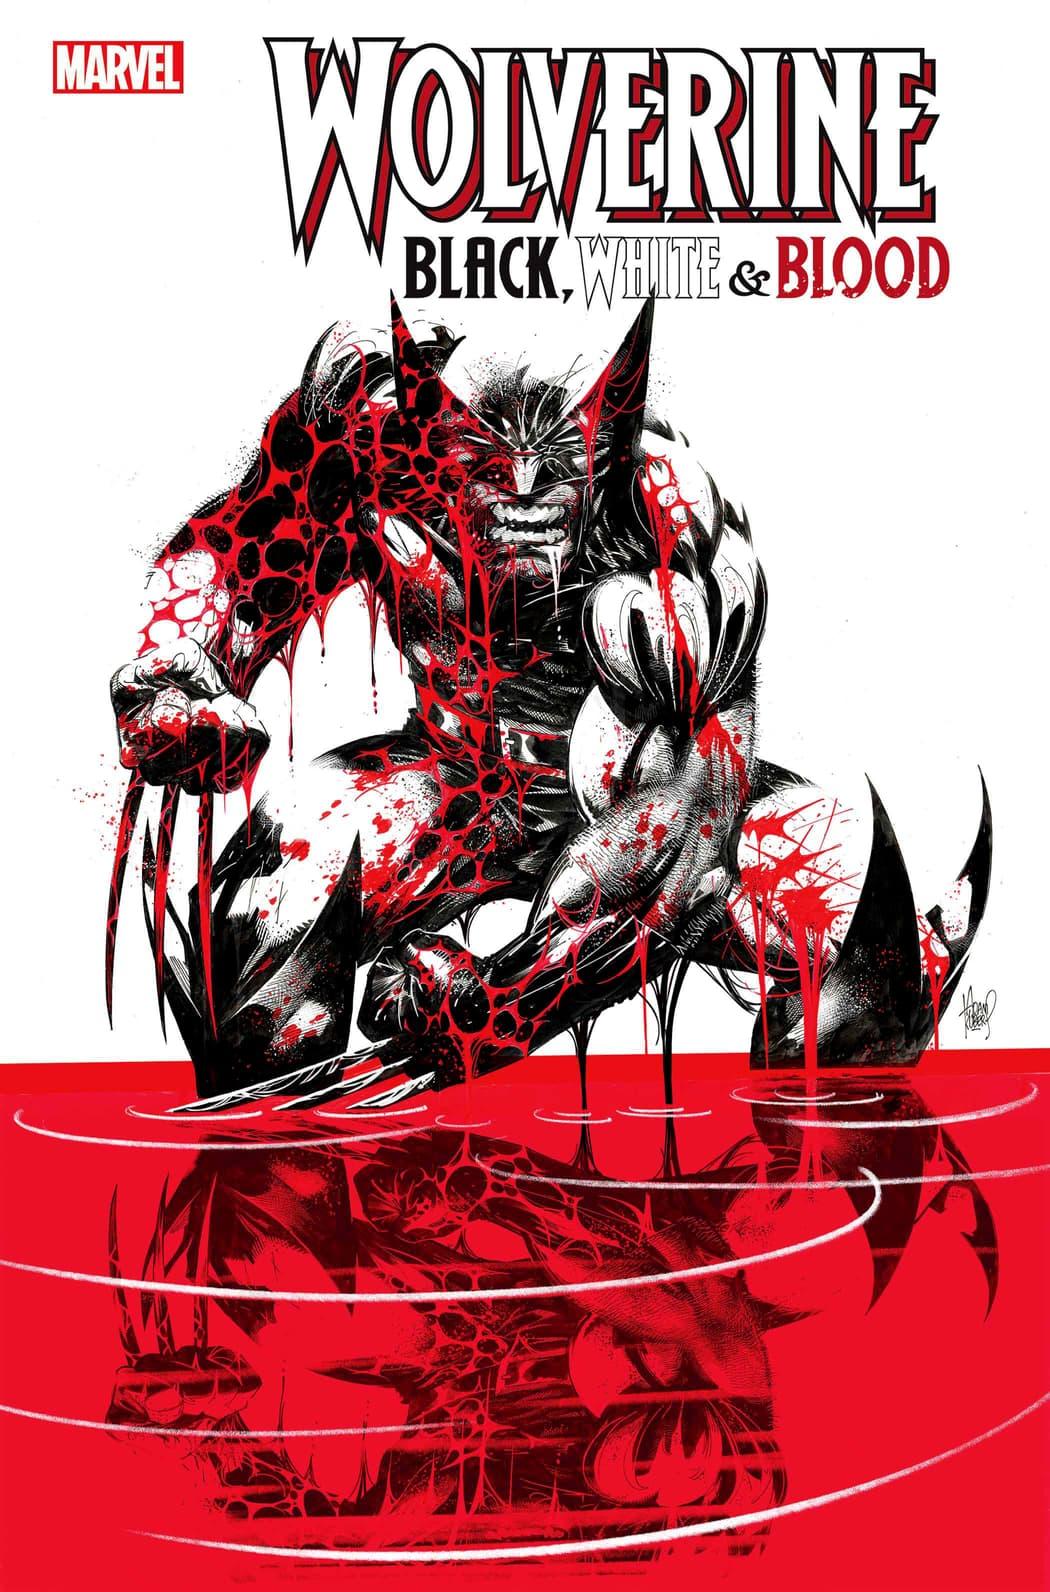 WOLVERINE: BLACK, WHITE & BLOOD #1 cover by Adam Kubert